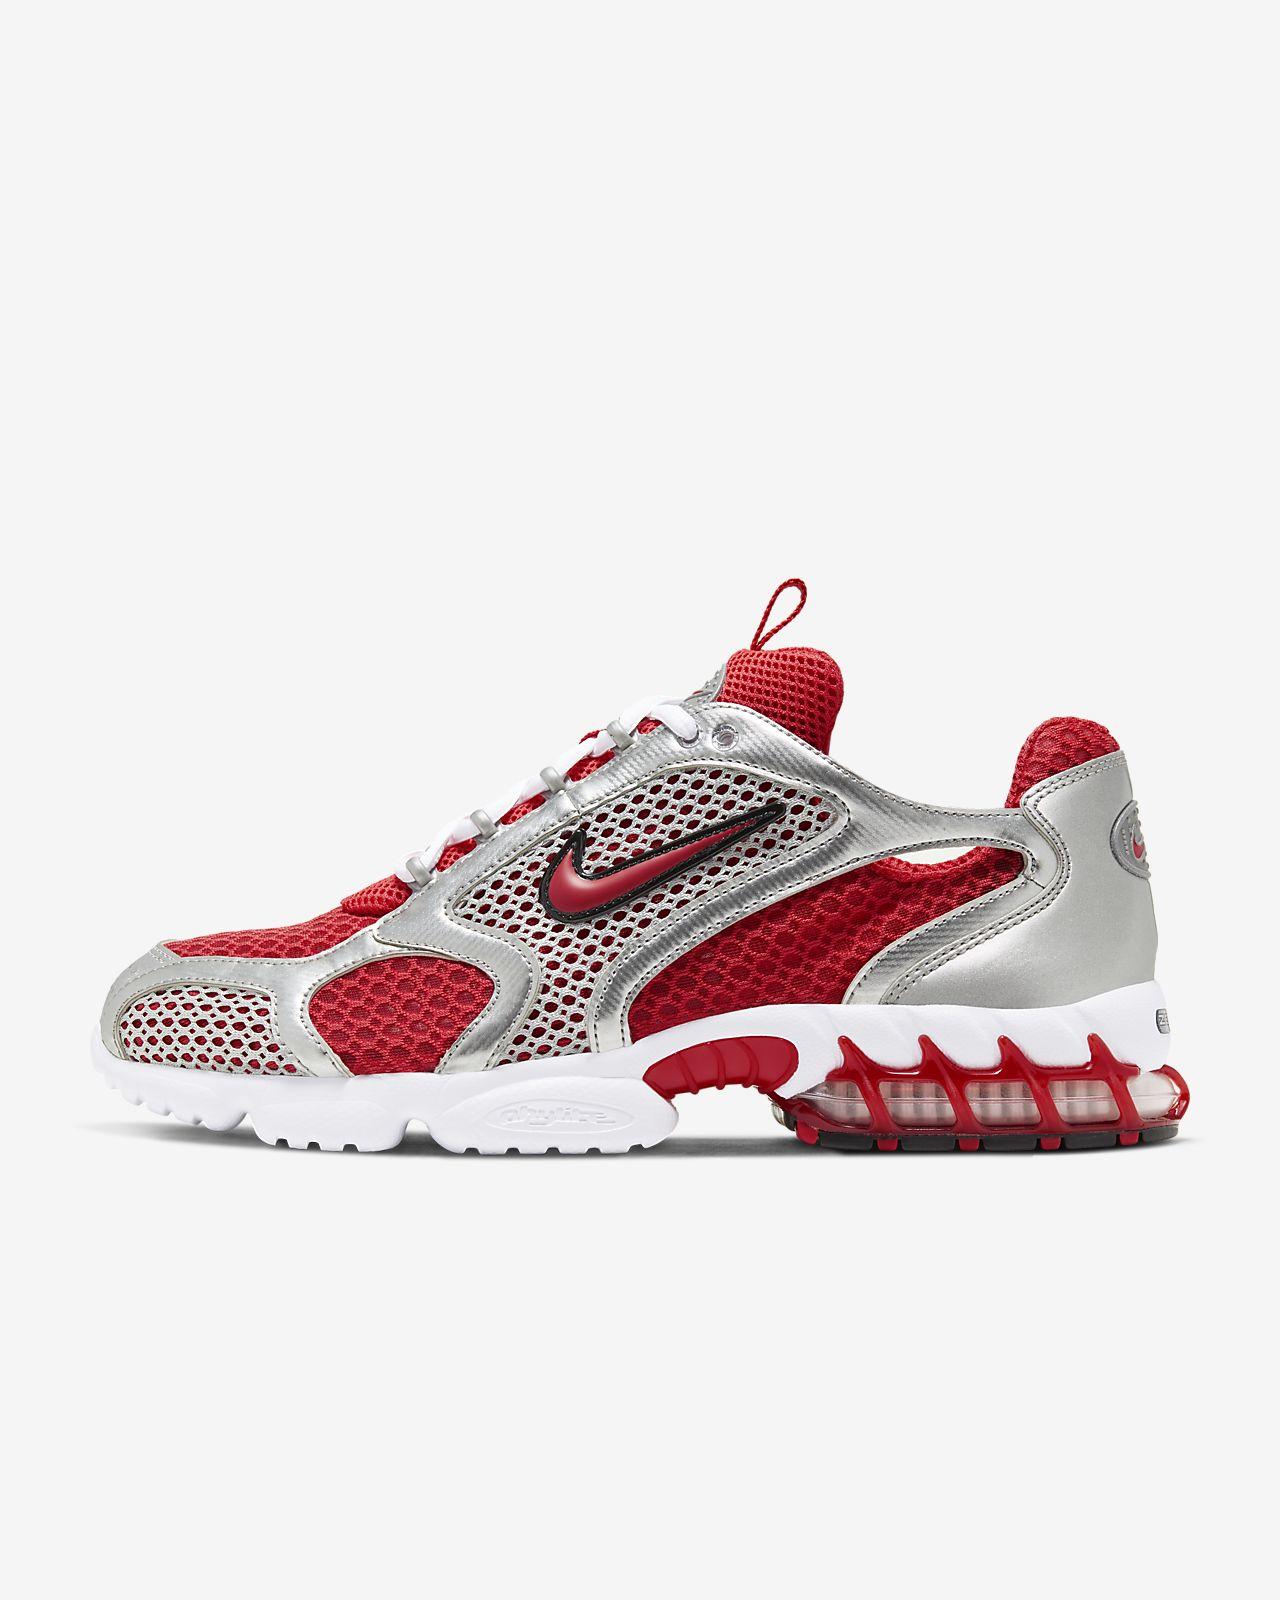 Pánská bota Nike Air Zoom Spiridon Cage 2